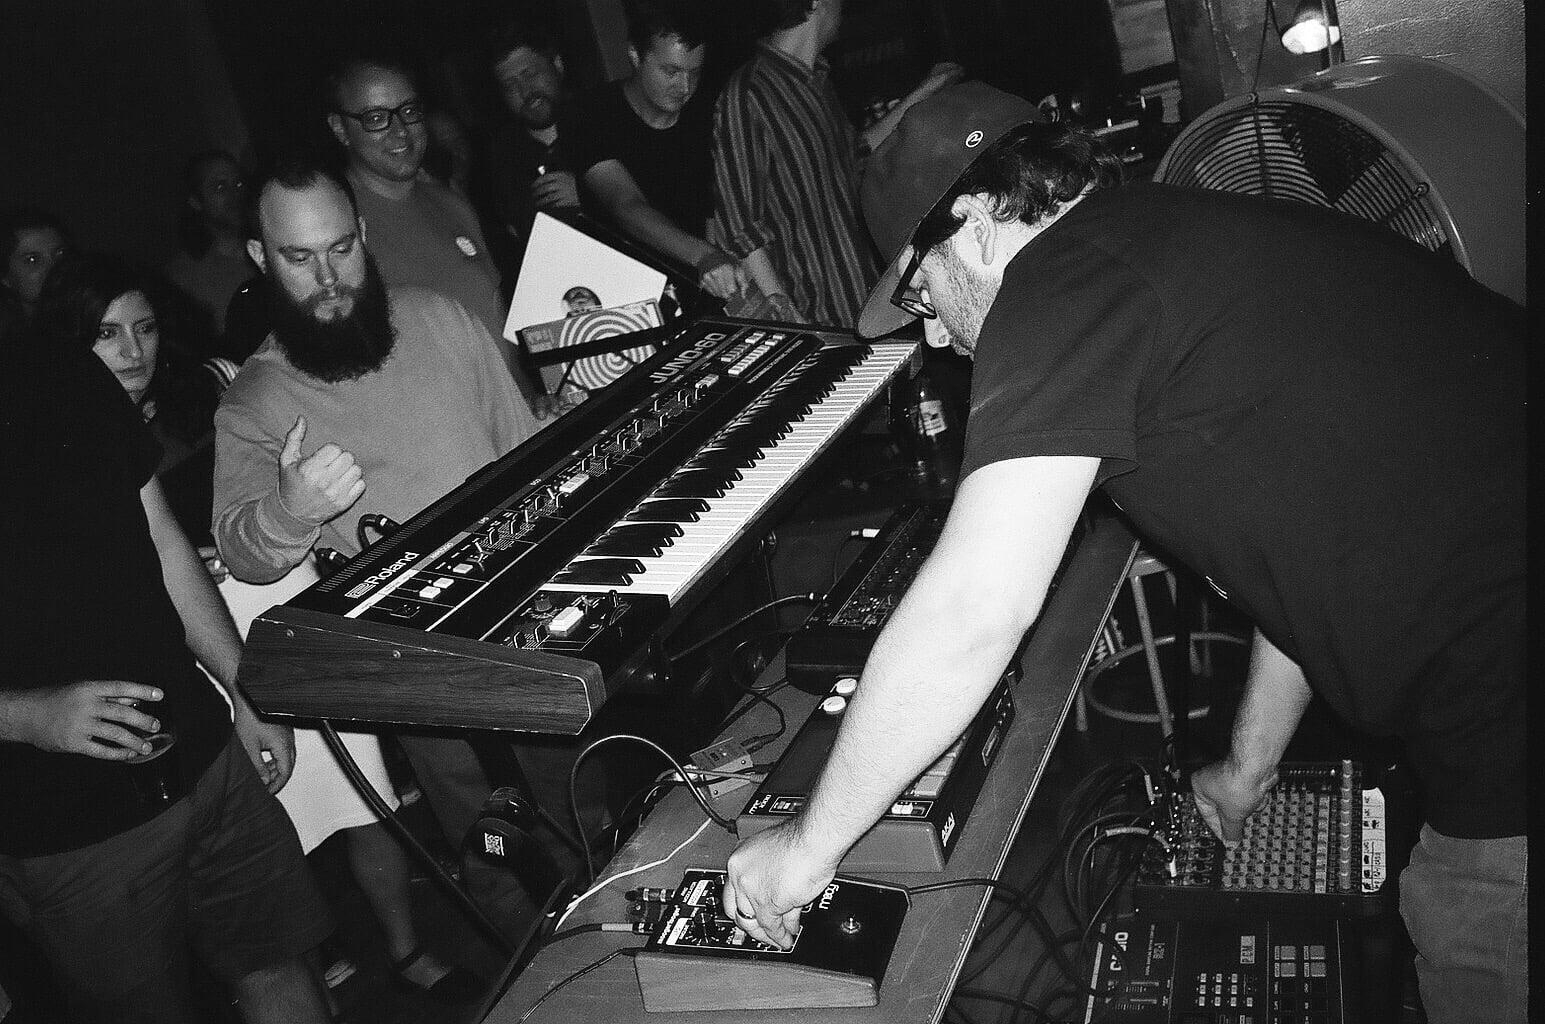 MAGAS live at H.O.T.H. at Danny's Tavern, Sept. 2015. Photo by Bobby Burg